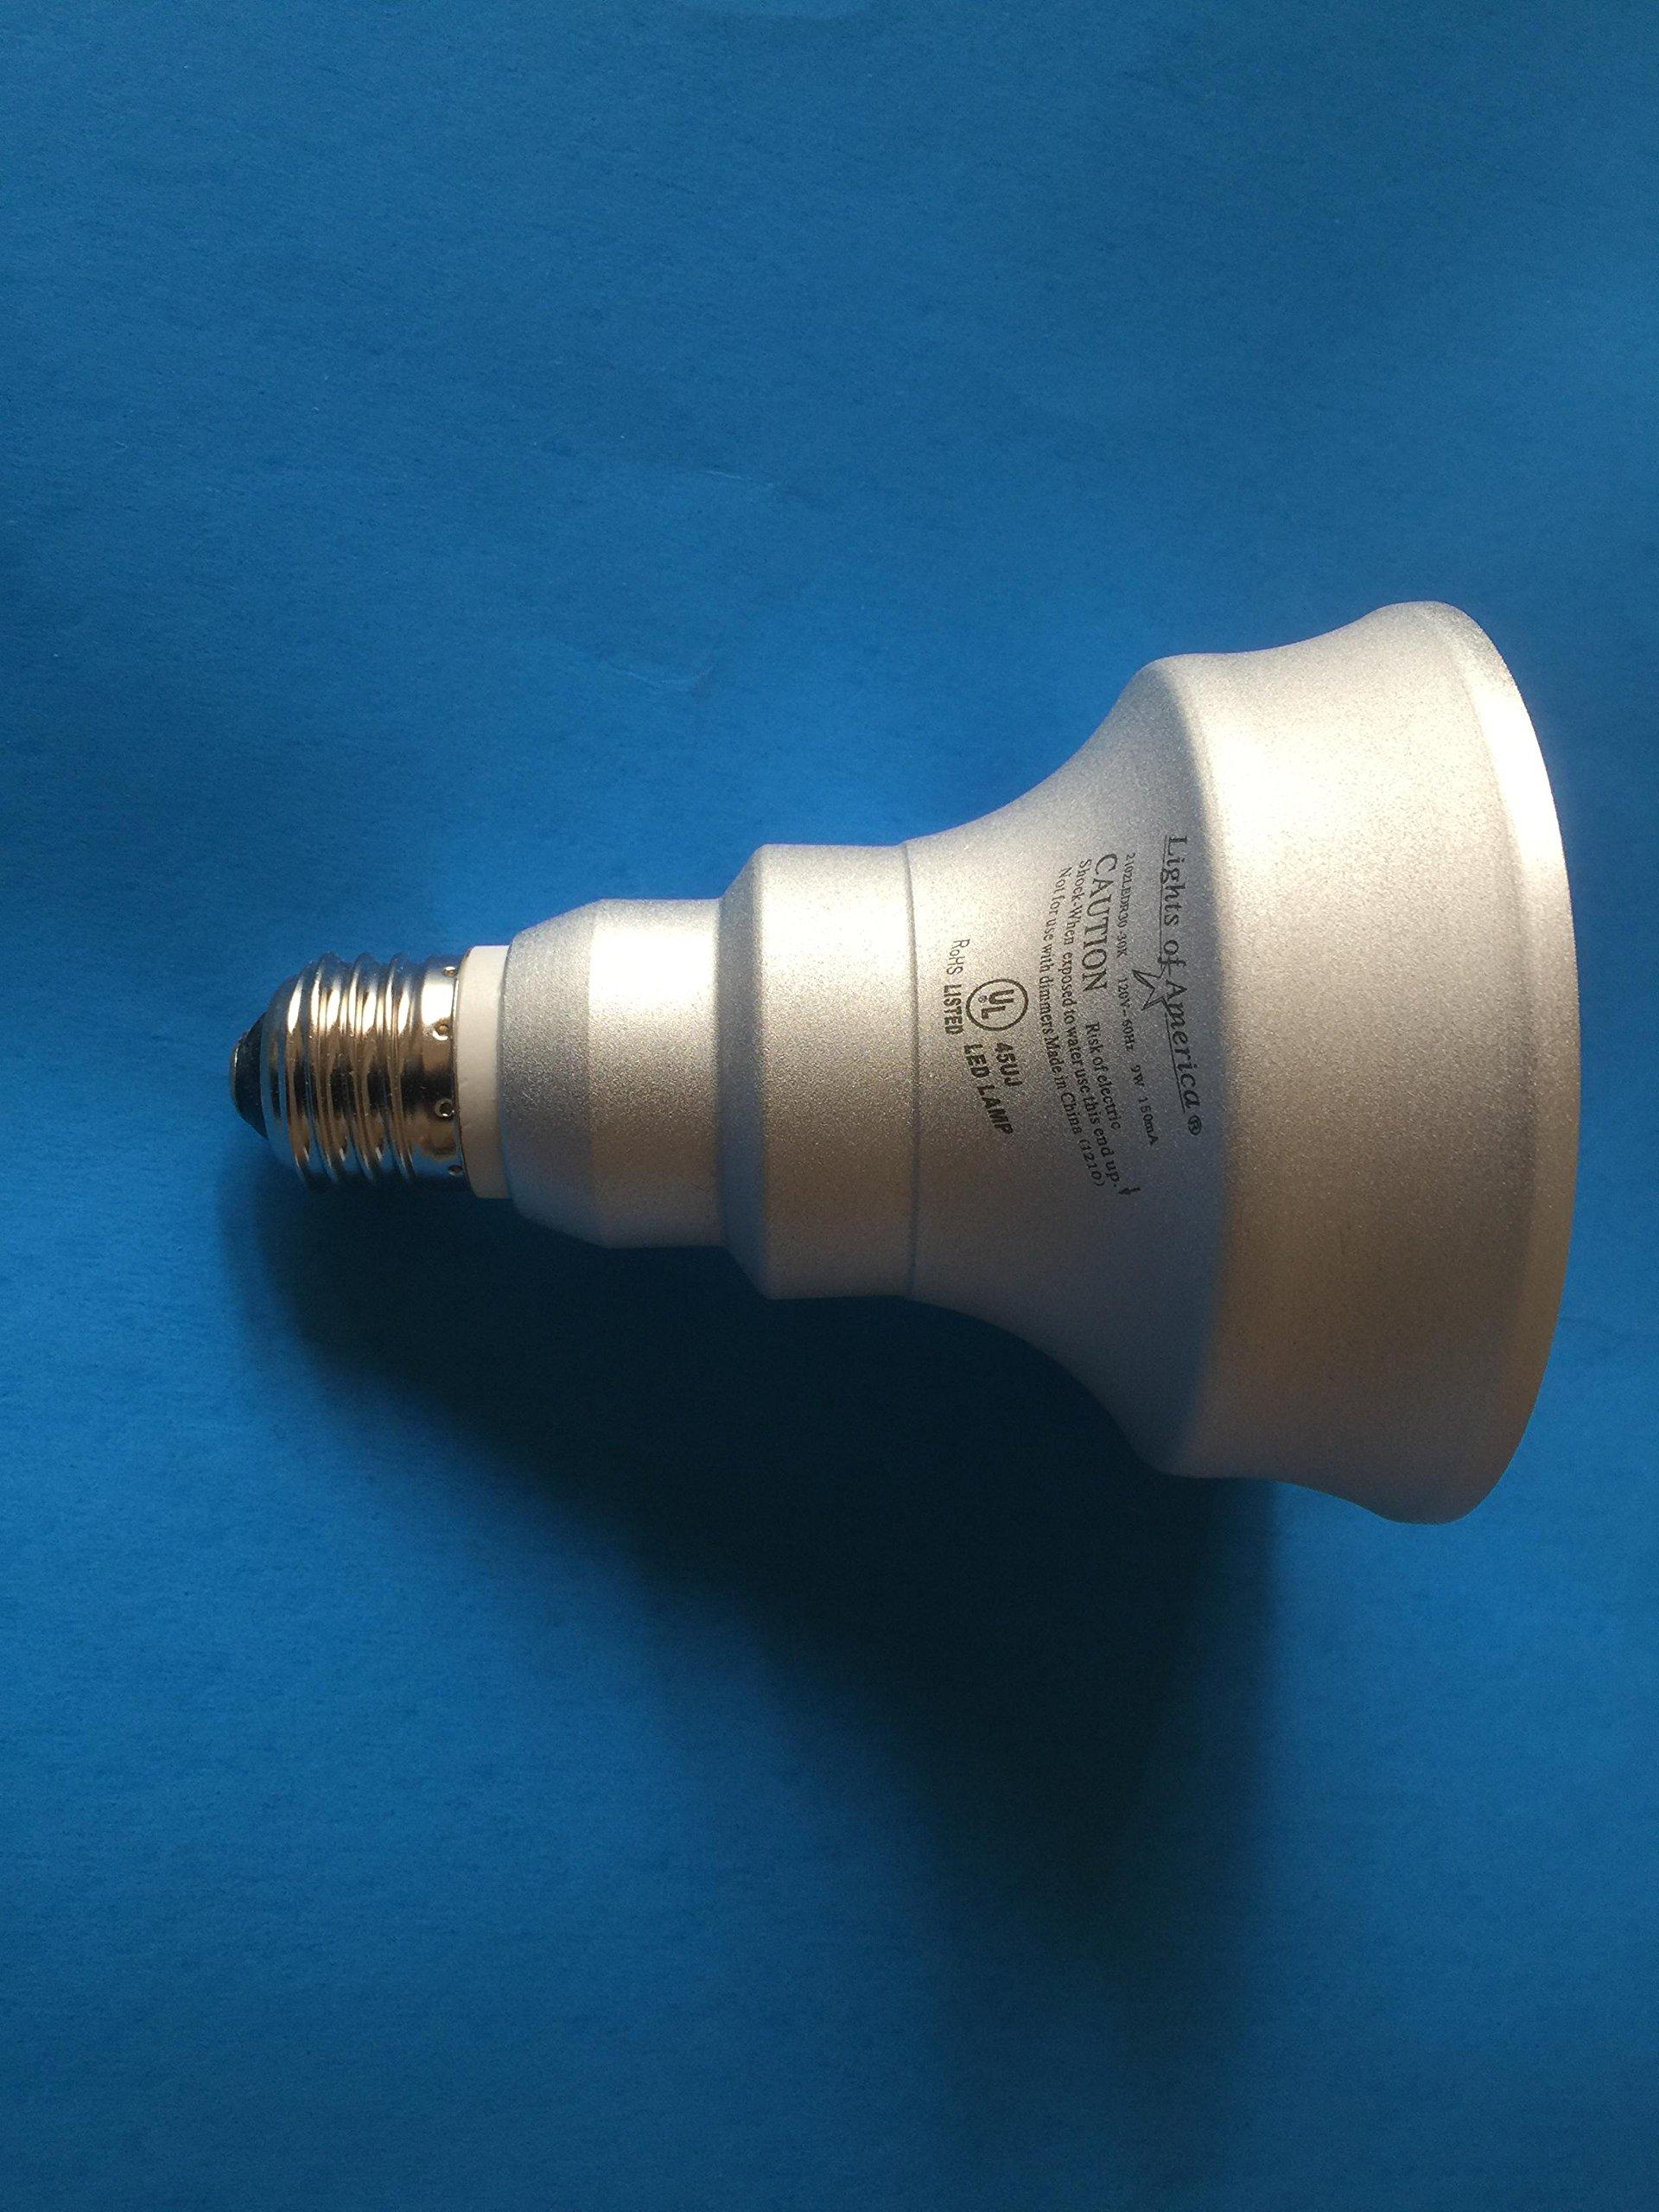 Lights of America 2102LEDR30-LF3-8 9-Watt Power LED R-30 Bulb